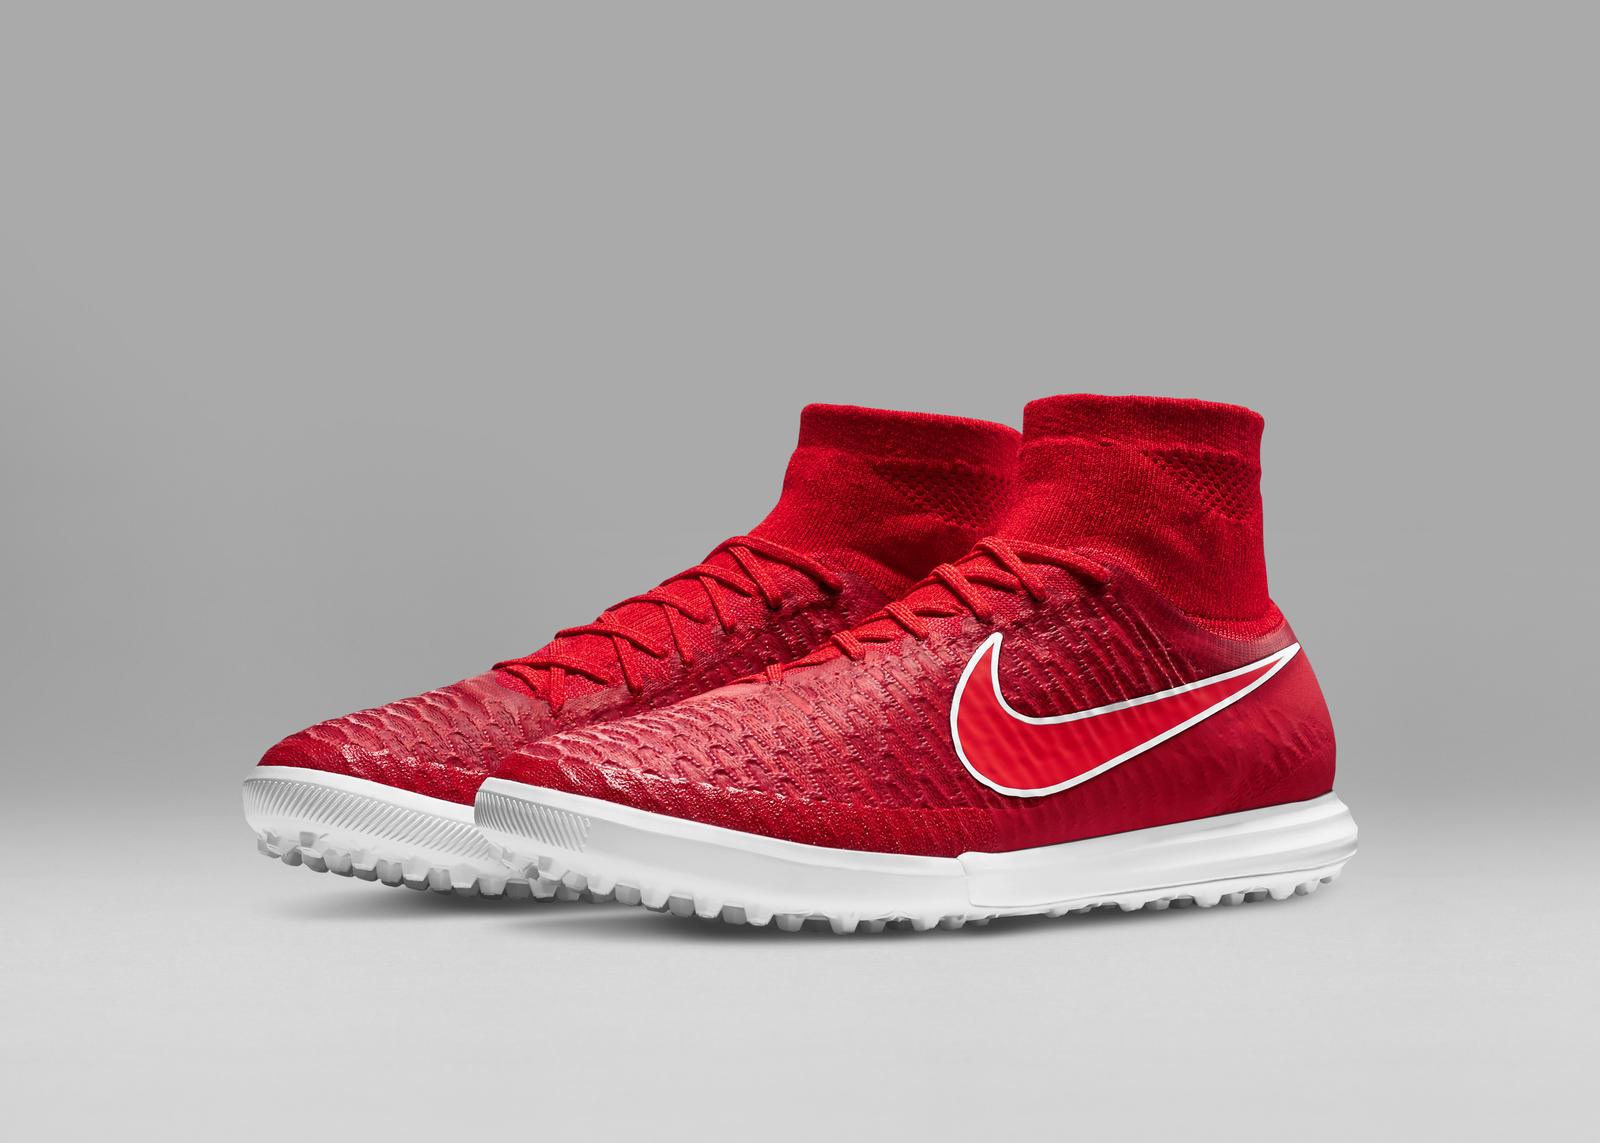 New NikeFootballX Colorways - Nike News